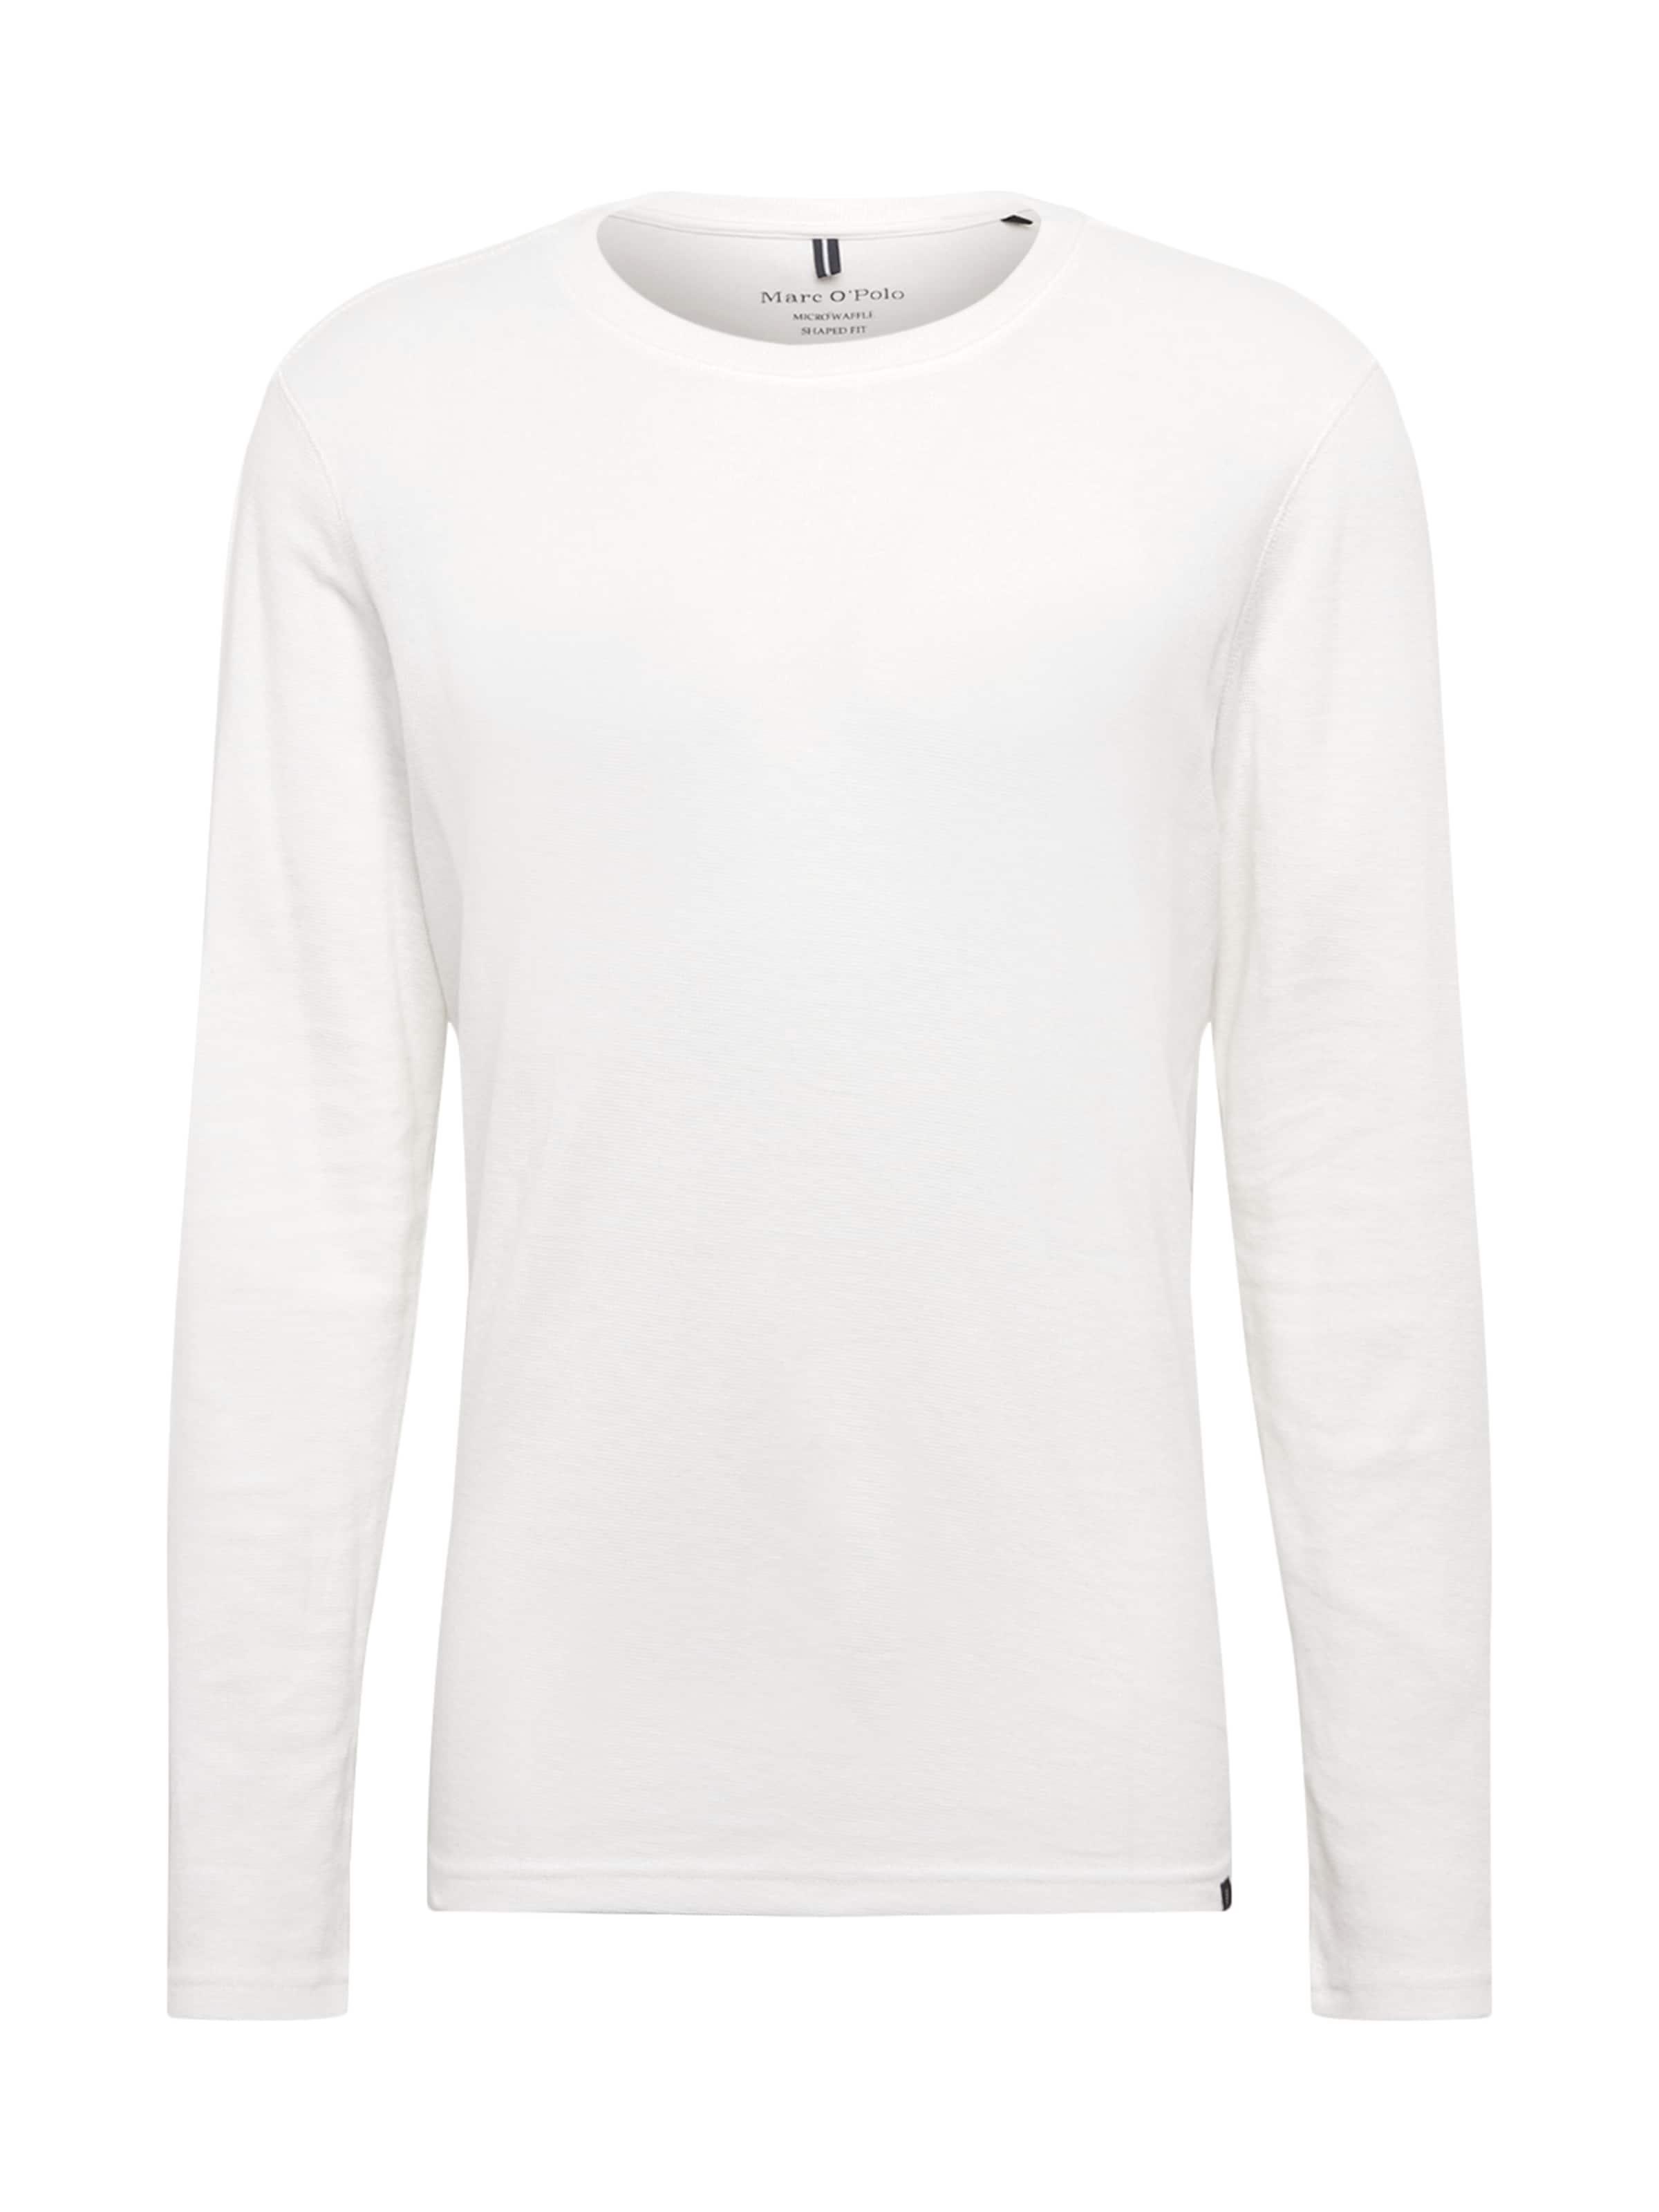 In Eierschale Marc O'polo O'polo Marc In Shirt Eierschale O'polo Shirt Shirt Marc Qrdtsh